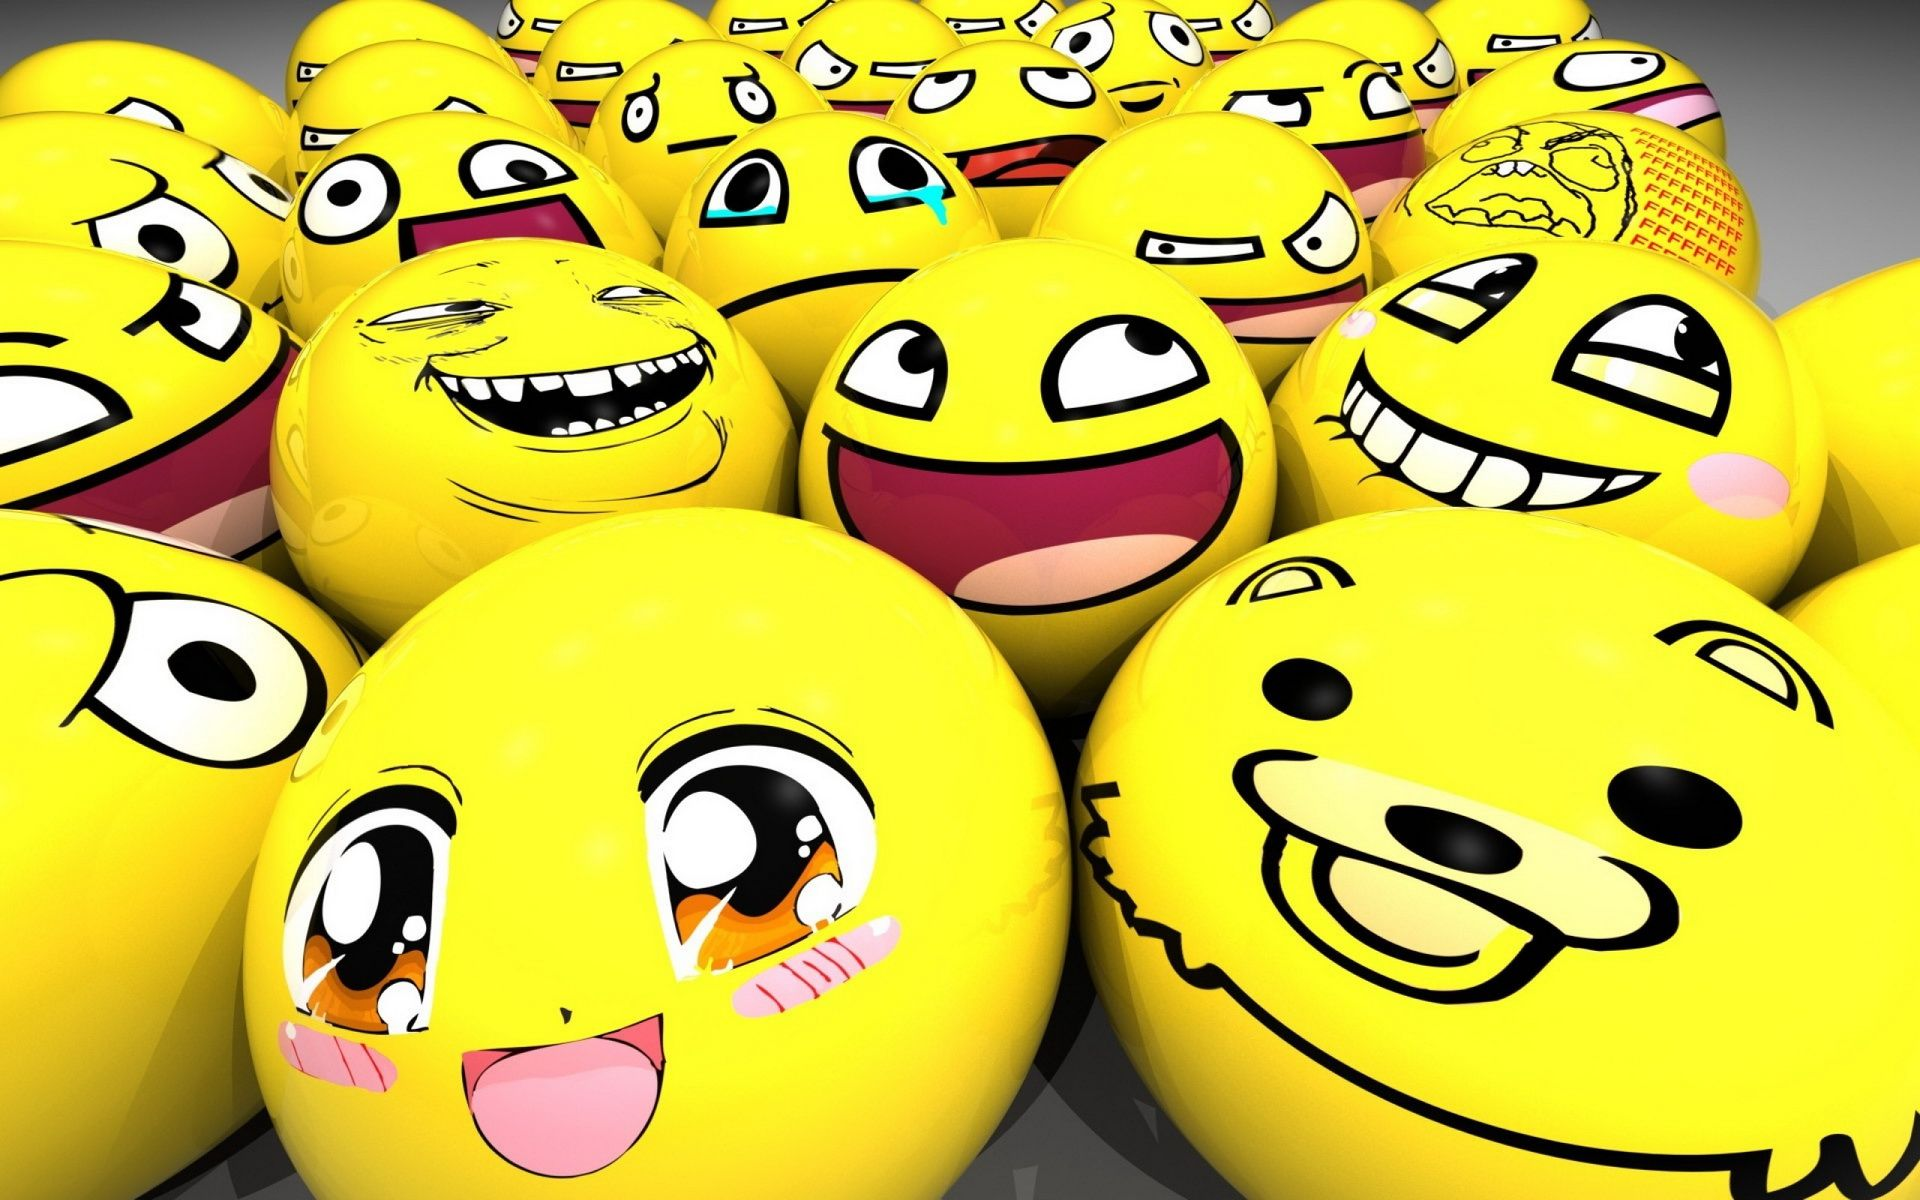 3e611bfc5c7644f03cfb5880de0220fd smiley wallpapers smileys pinterest smiley, wallpaper and